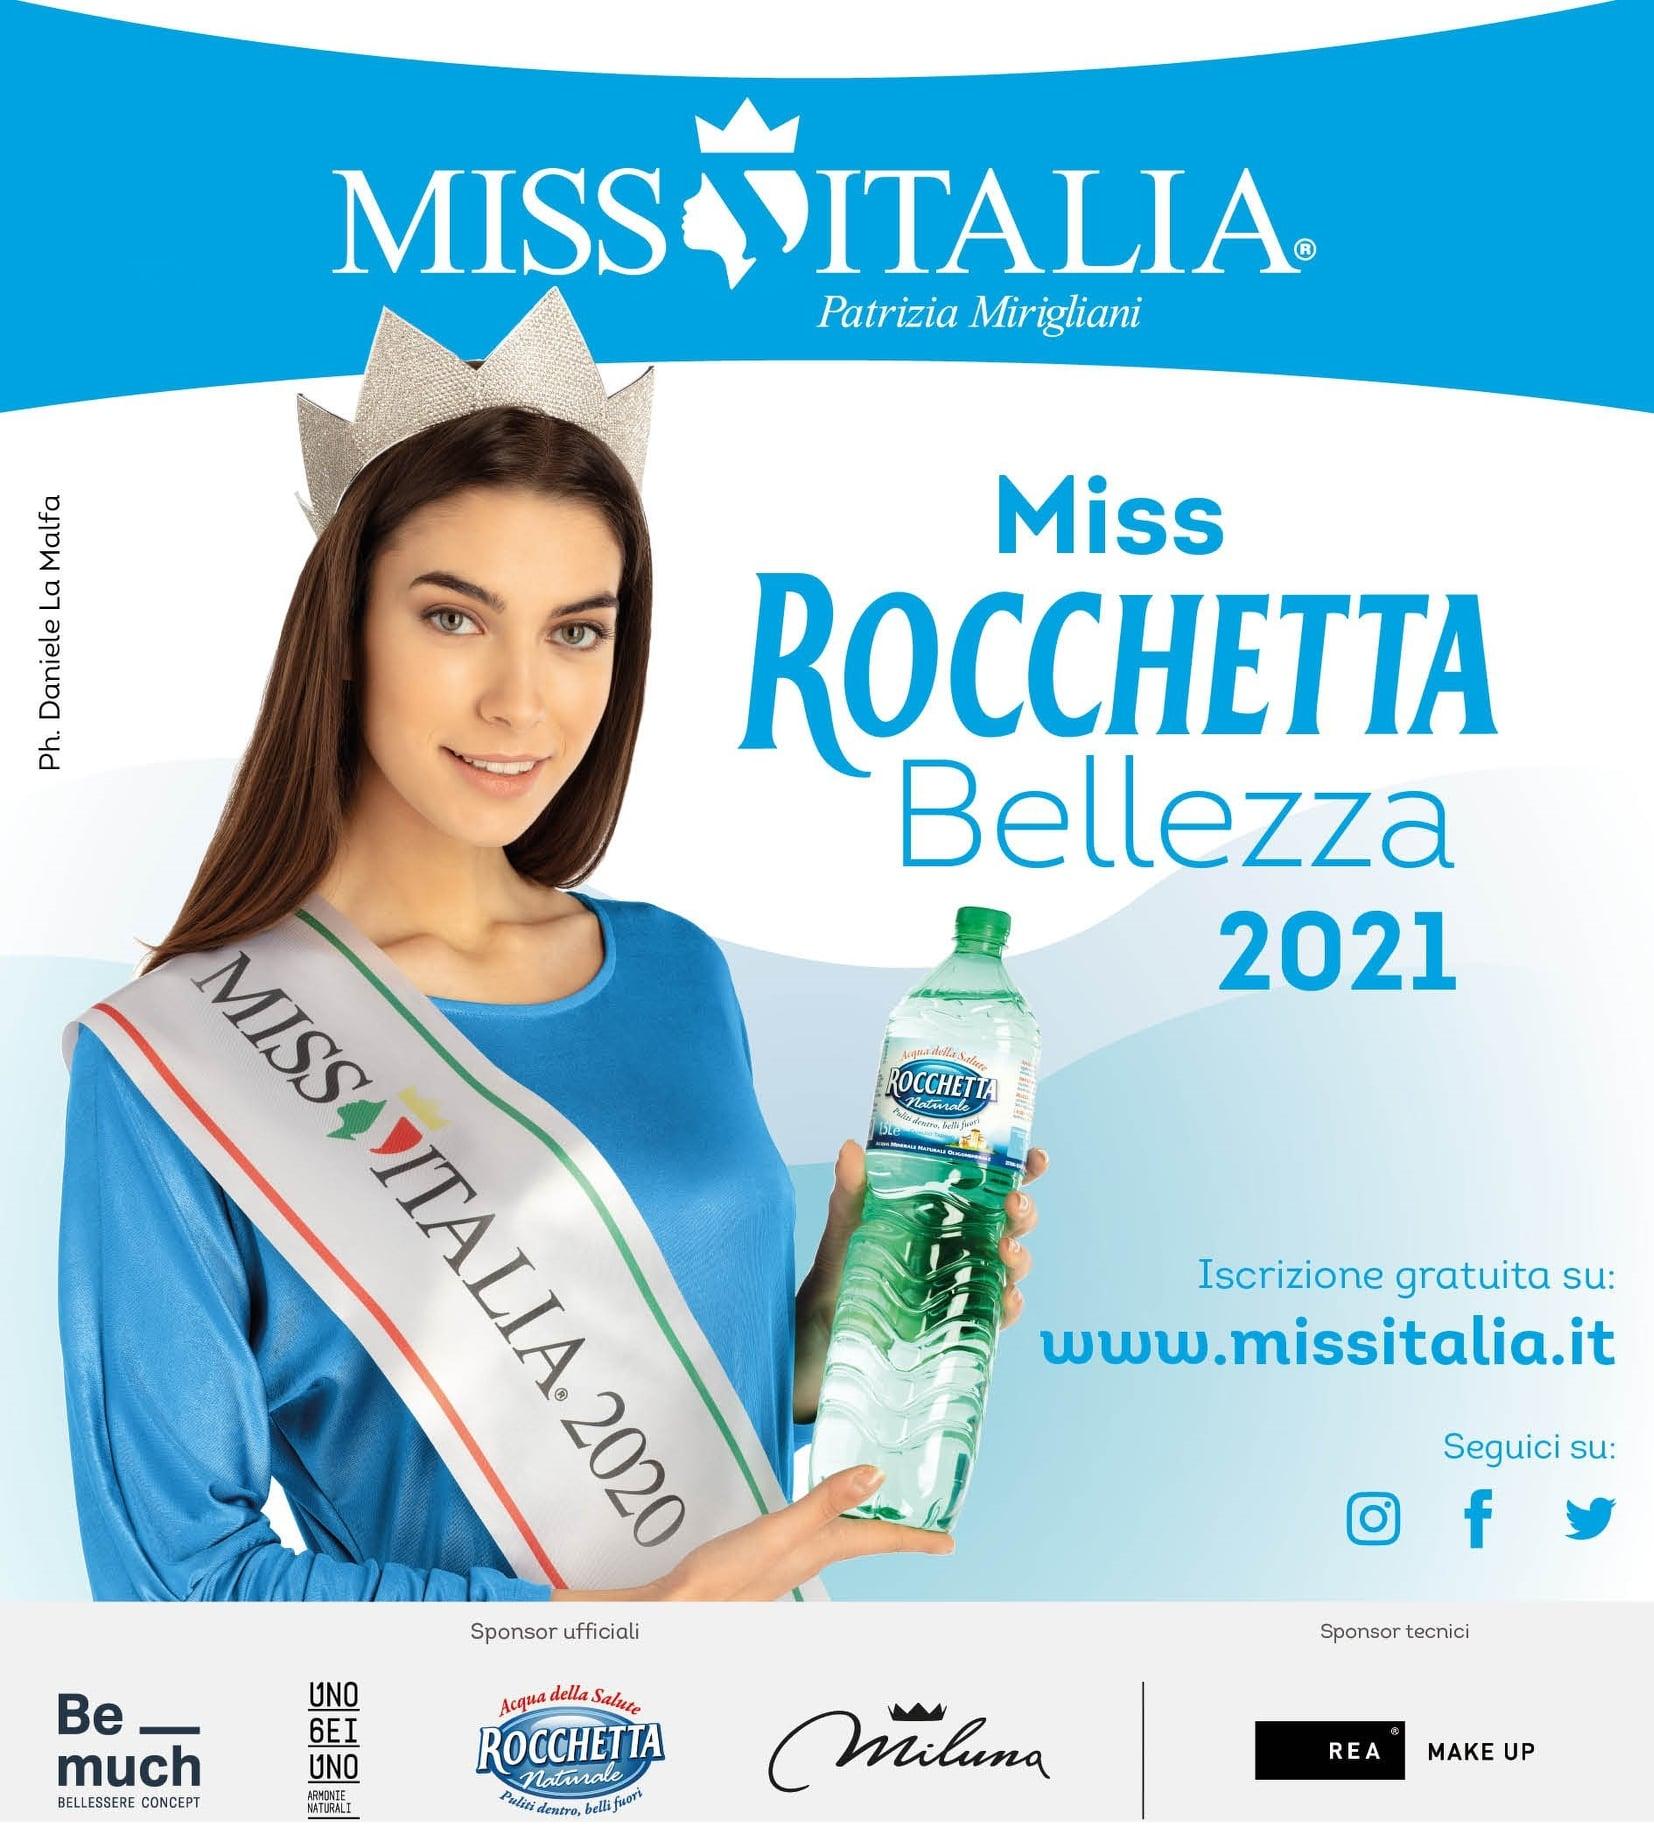 MISS ROCCHETTA FRIULI VENEZIA GIULIA